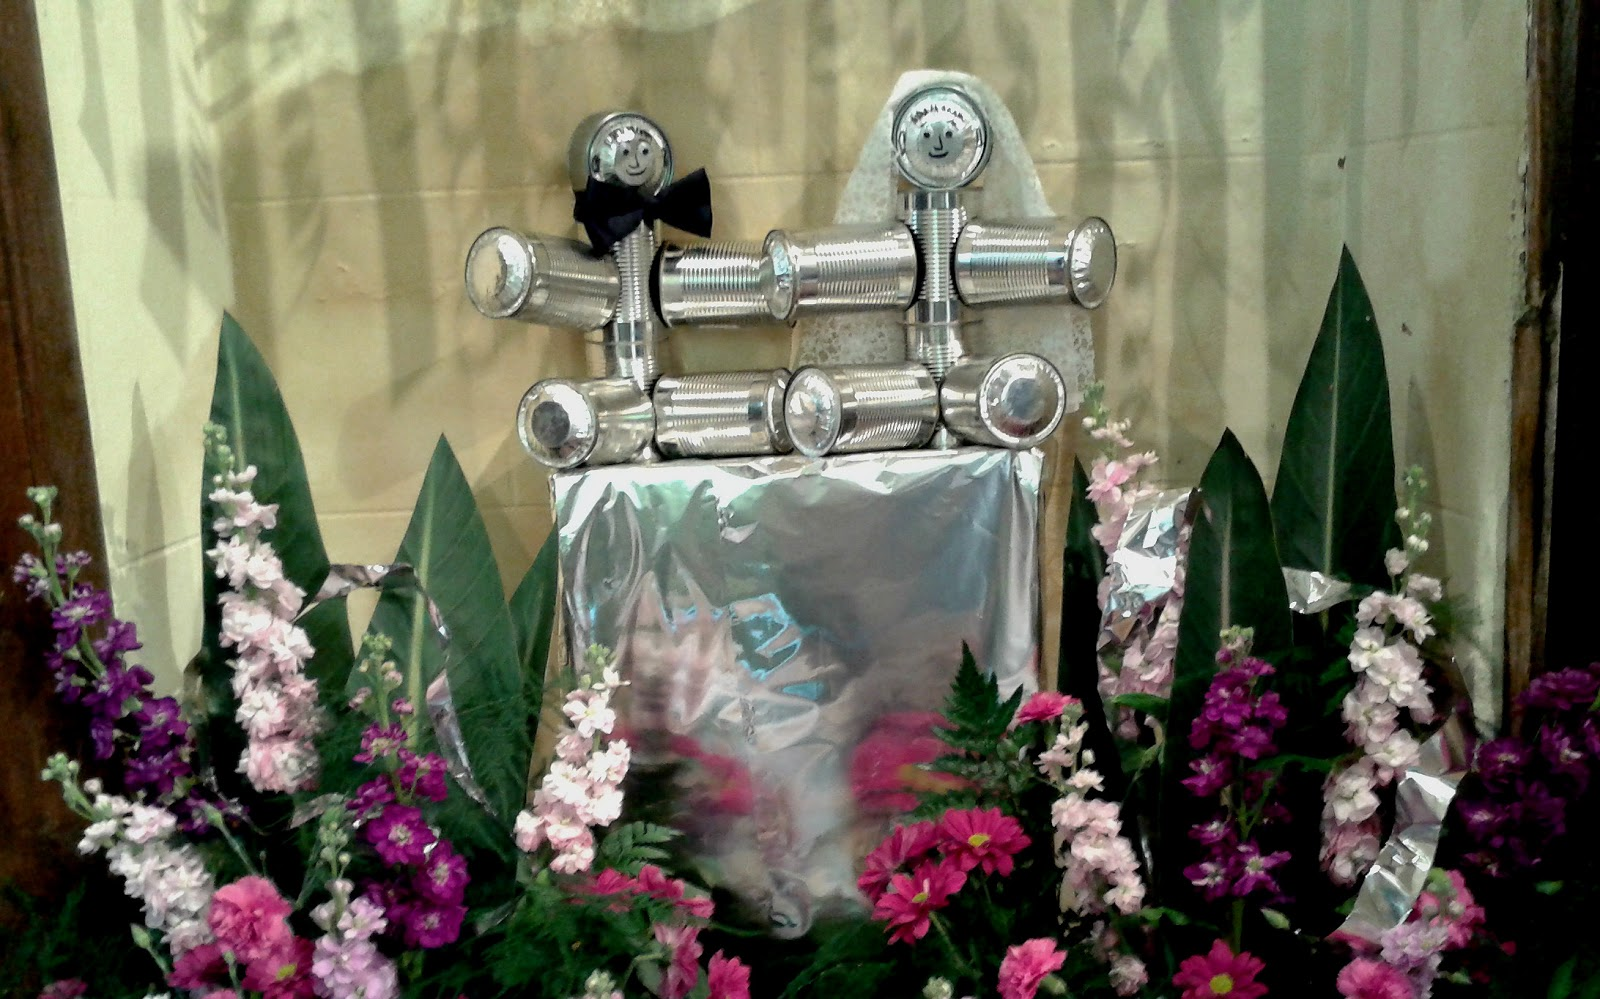 Tin Wedding Anniversary flower display